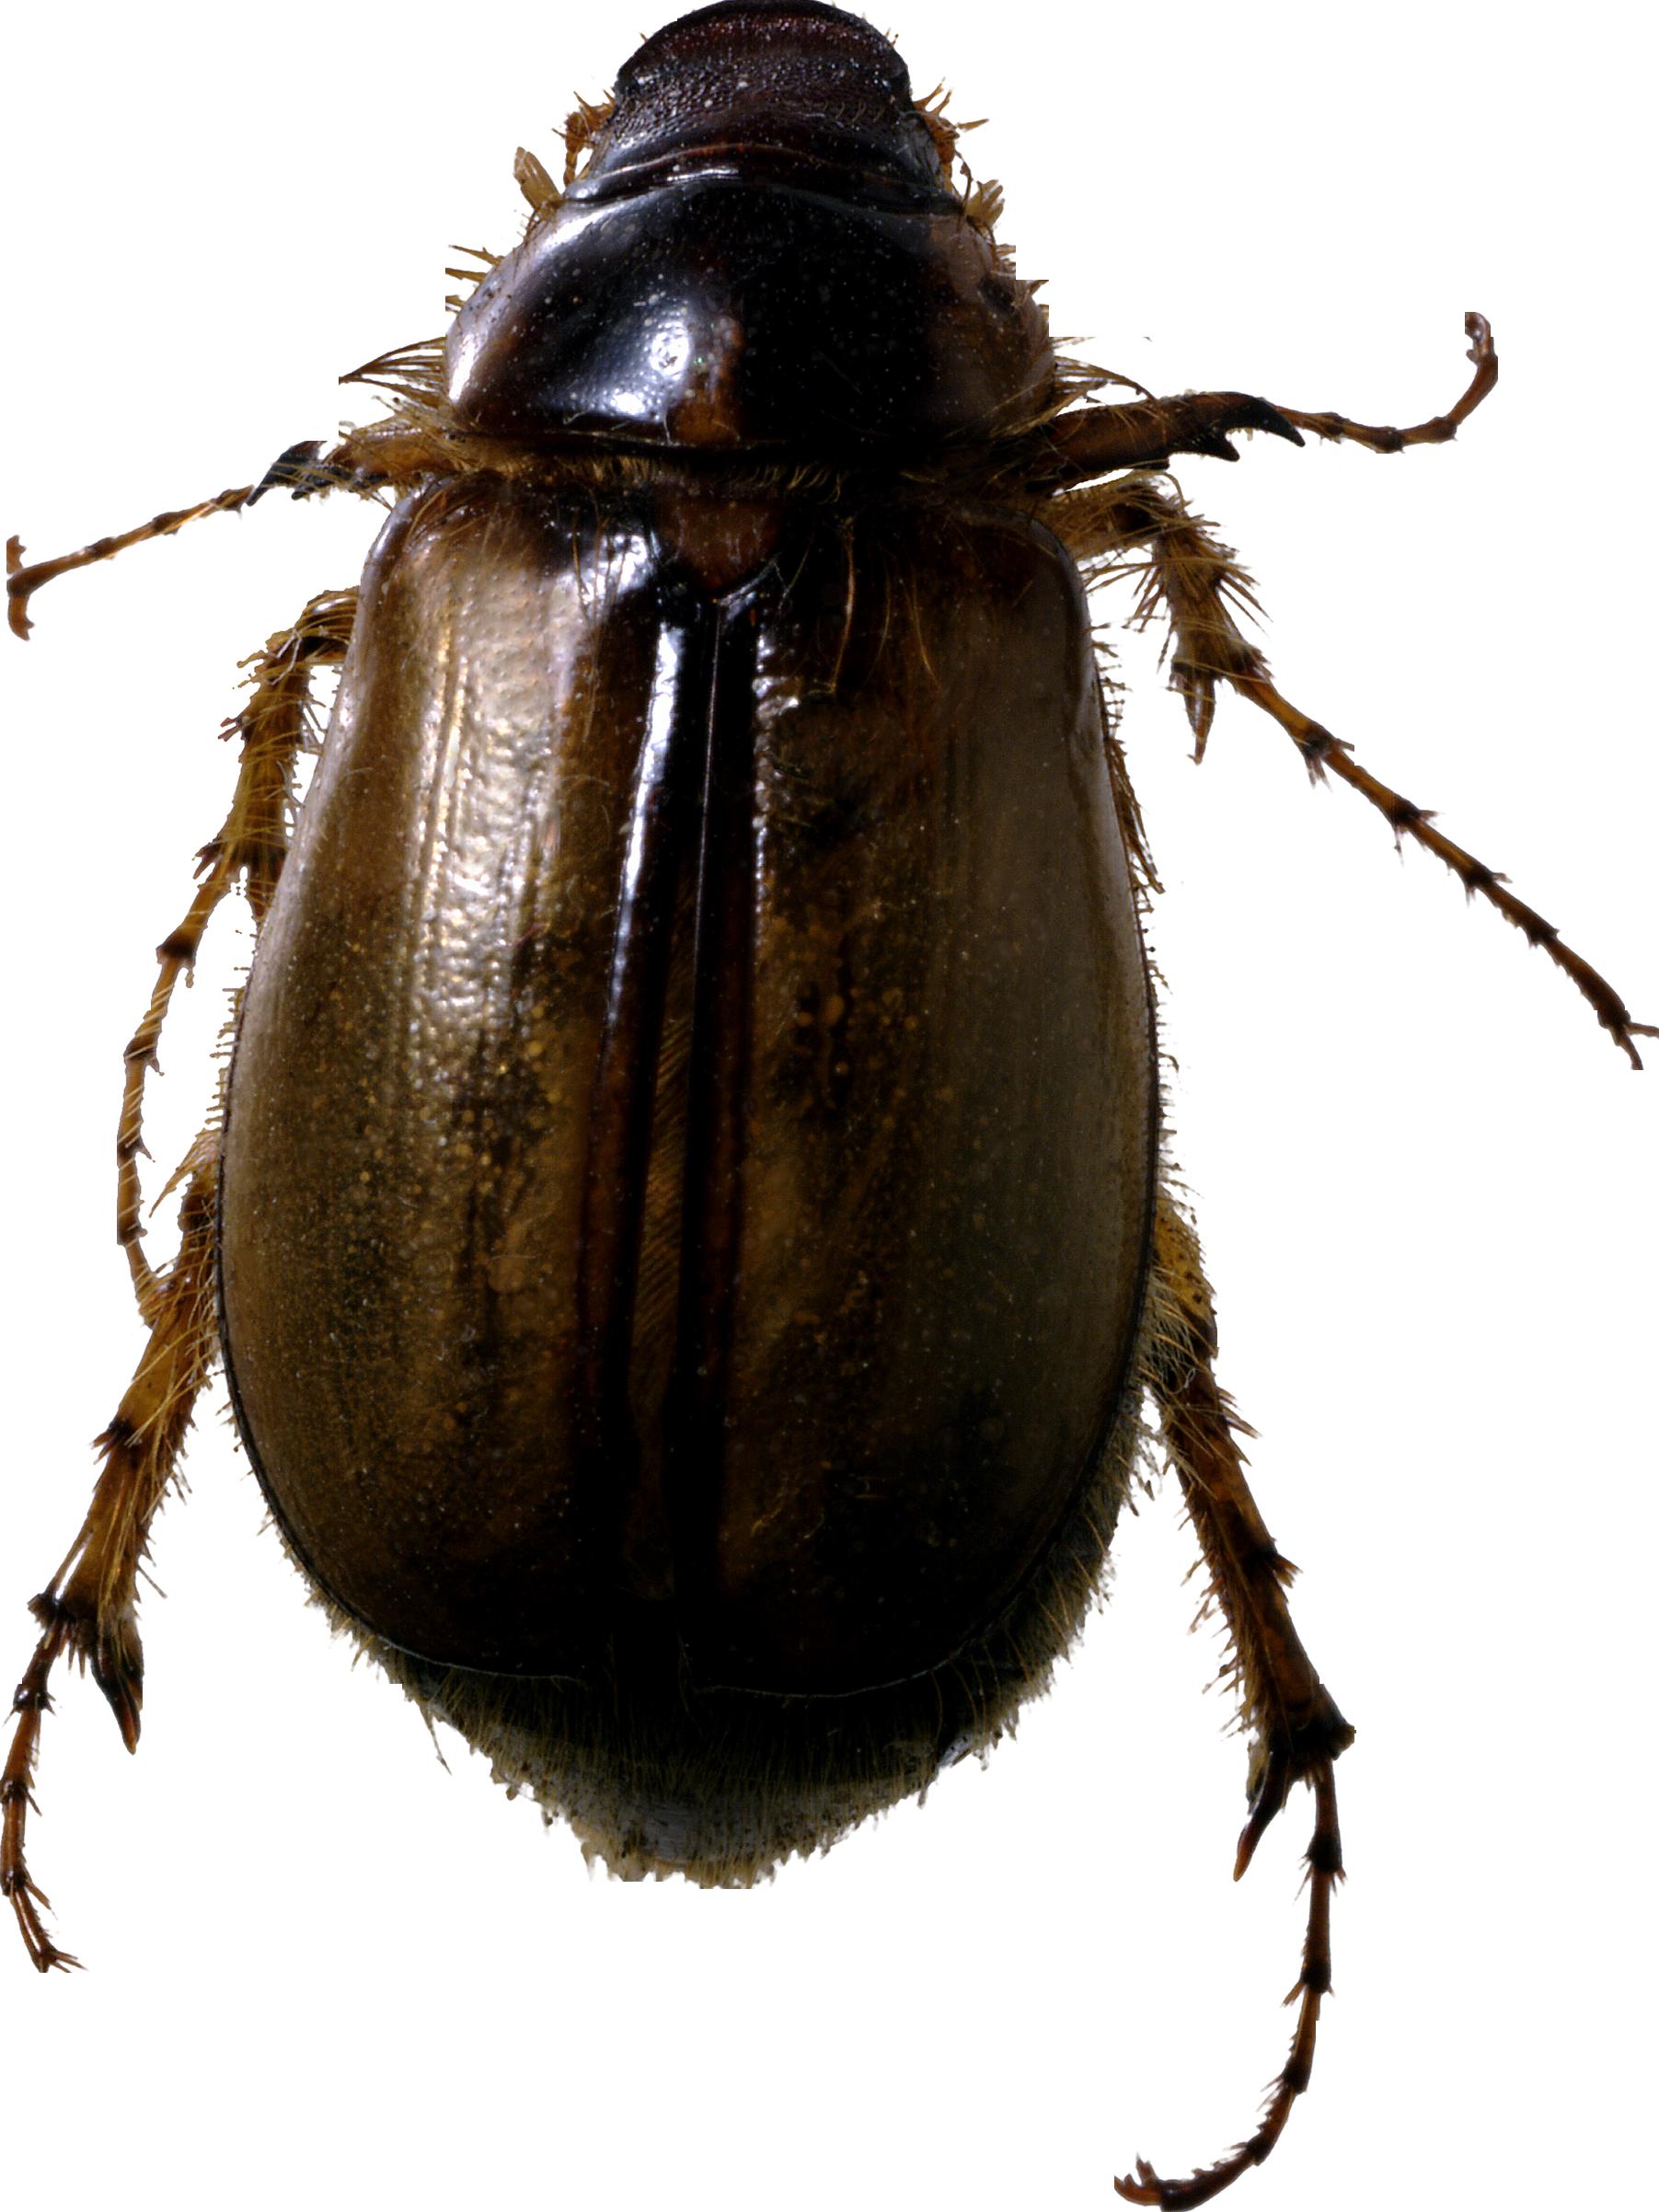 roach bug PNG image - Bug PNG